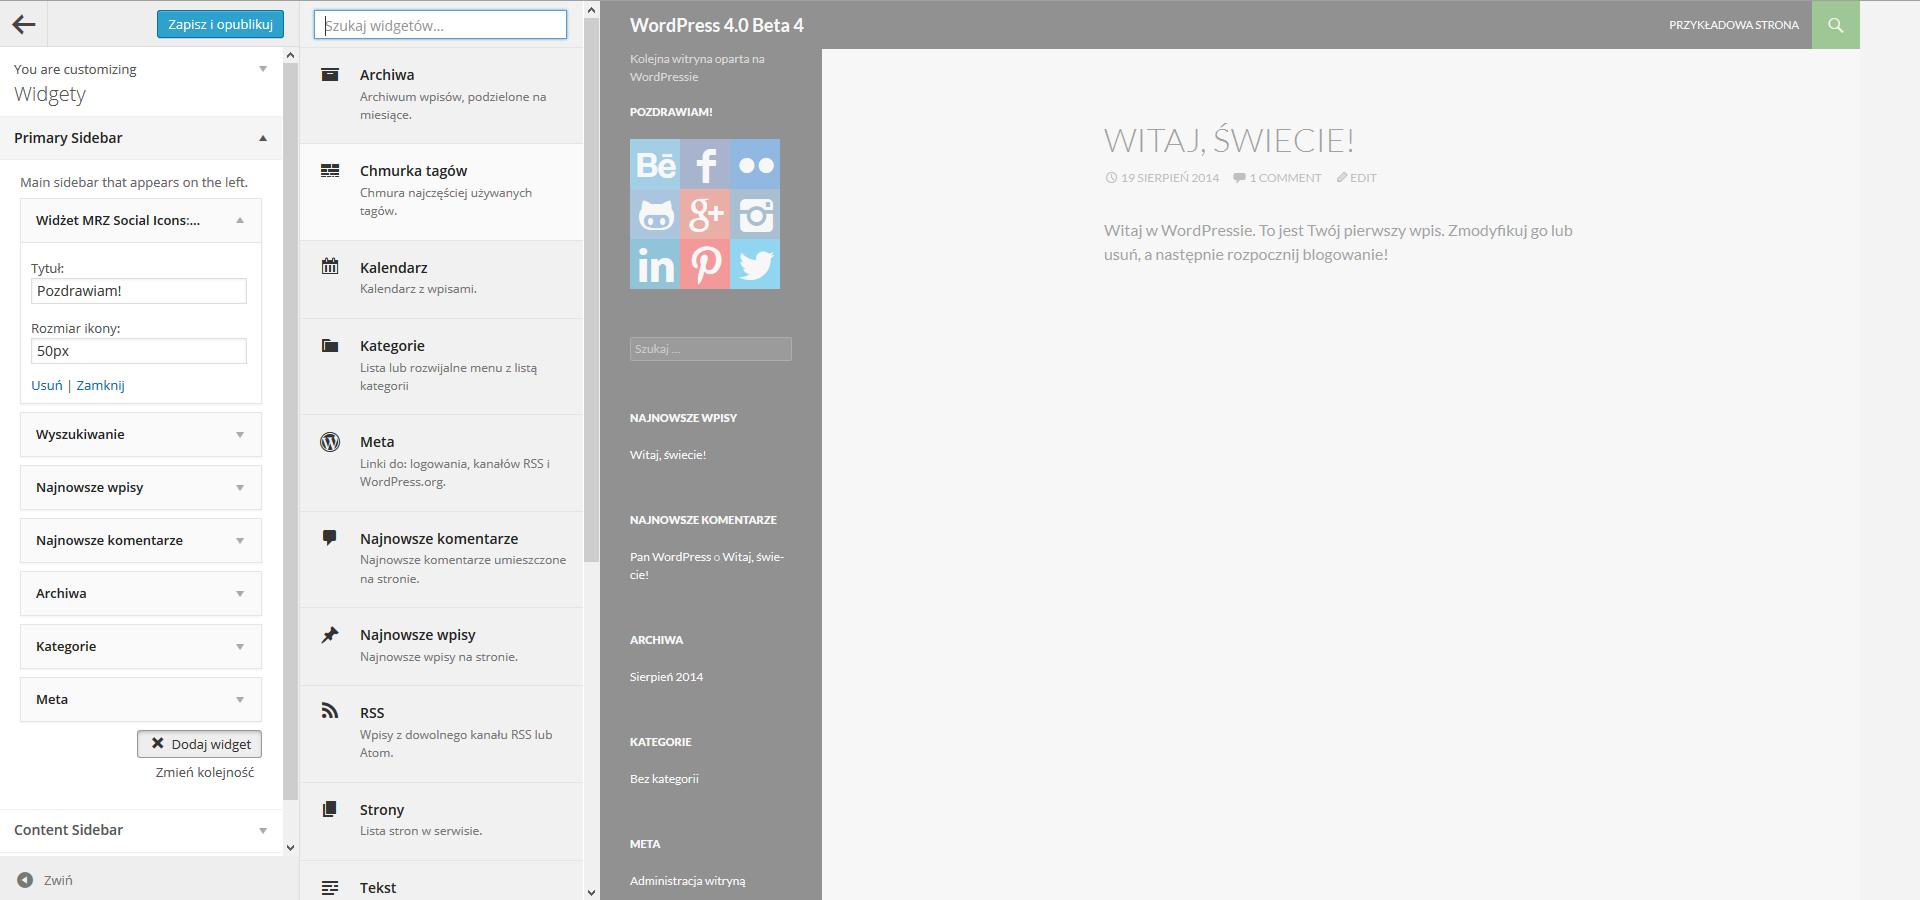 wordpress-4.0-beta-08